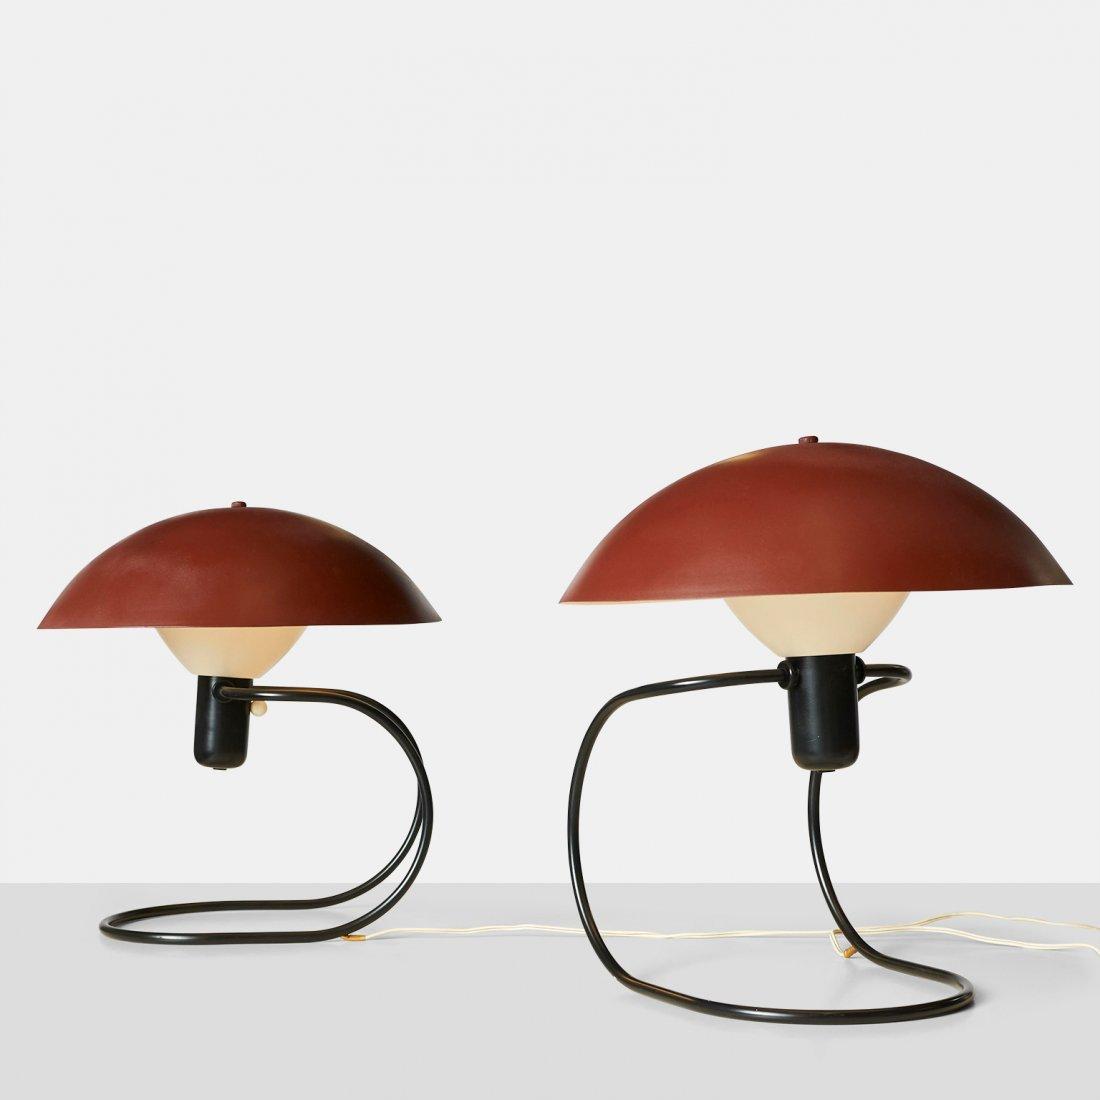 Greta Von Nessen, Pair of 'Anywhere' Lamps